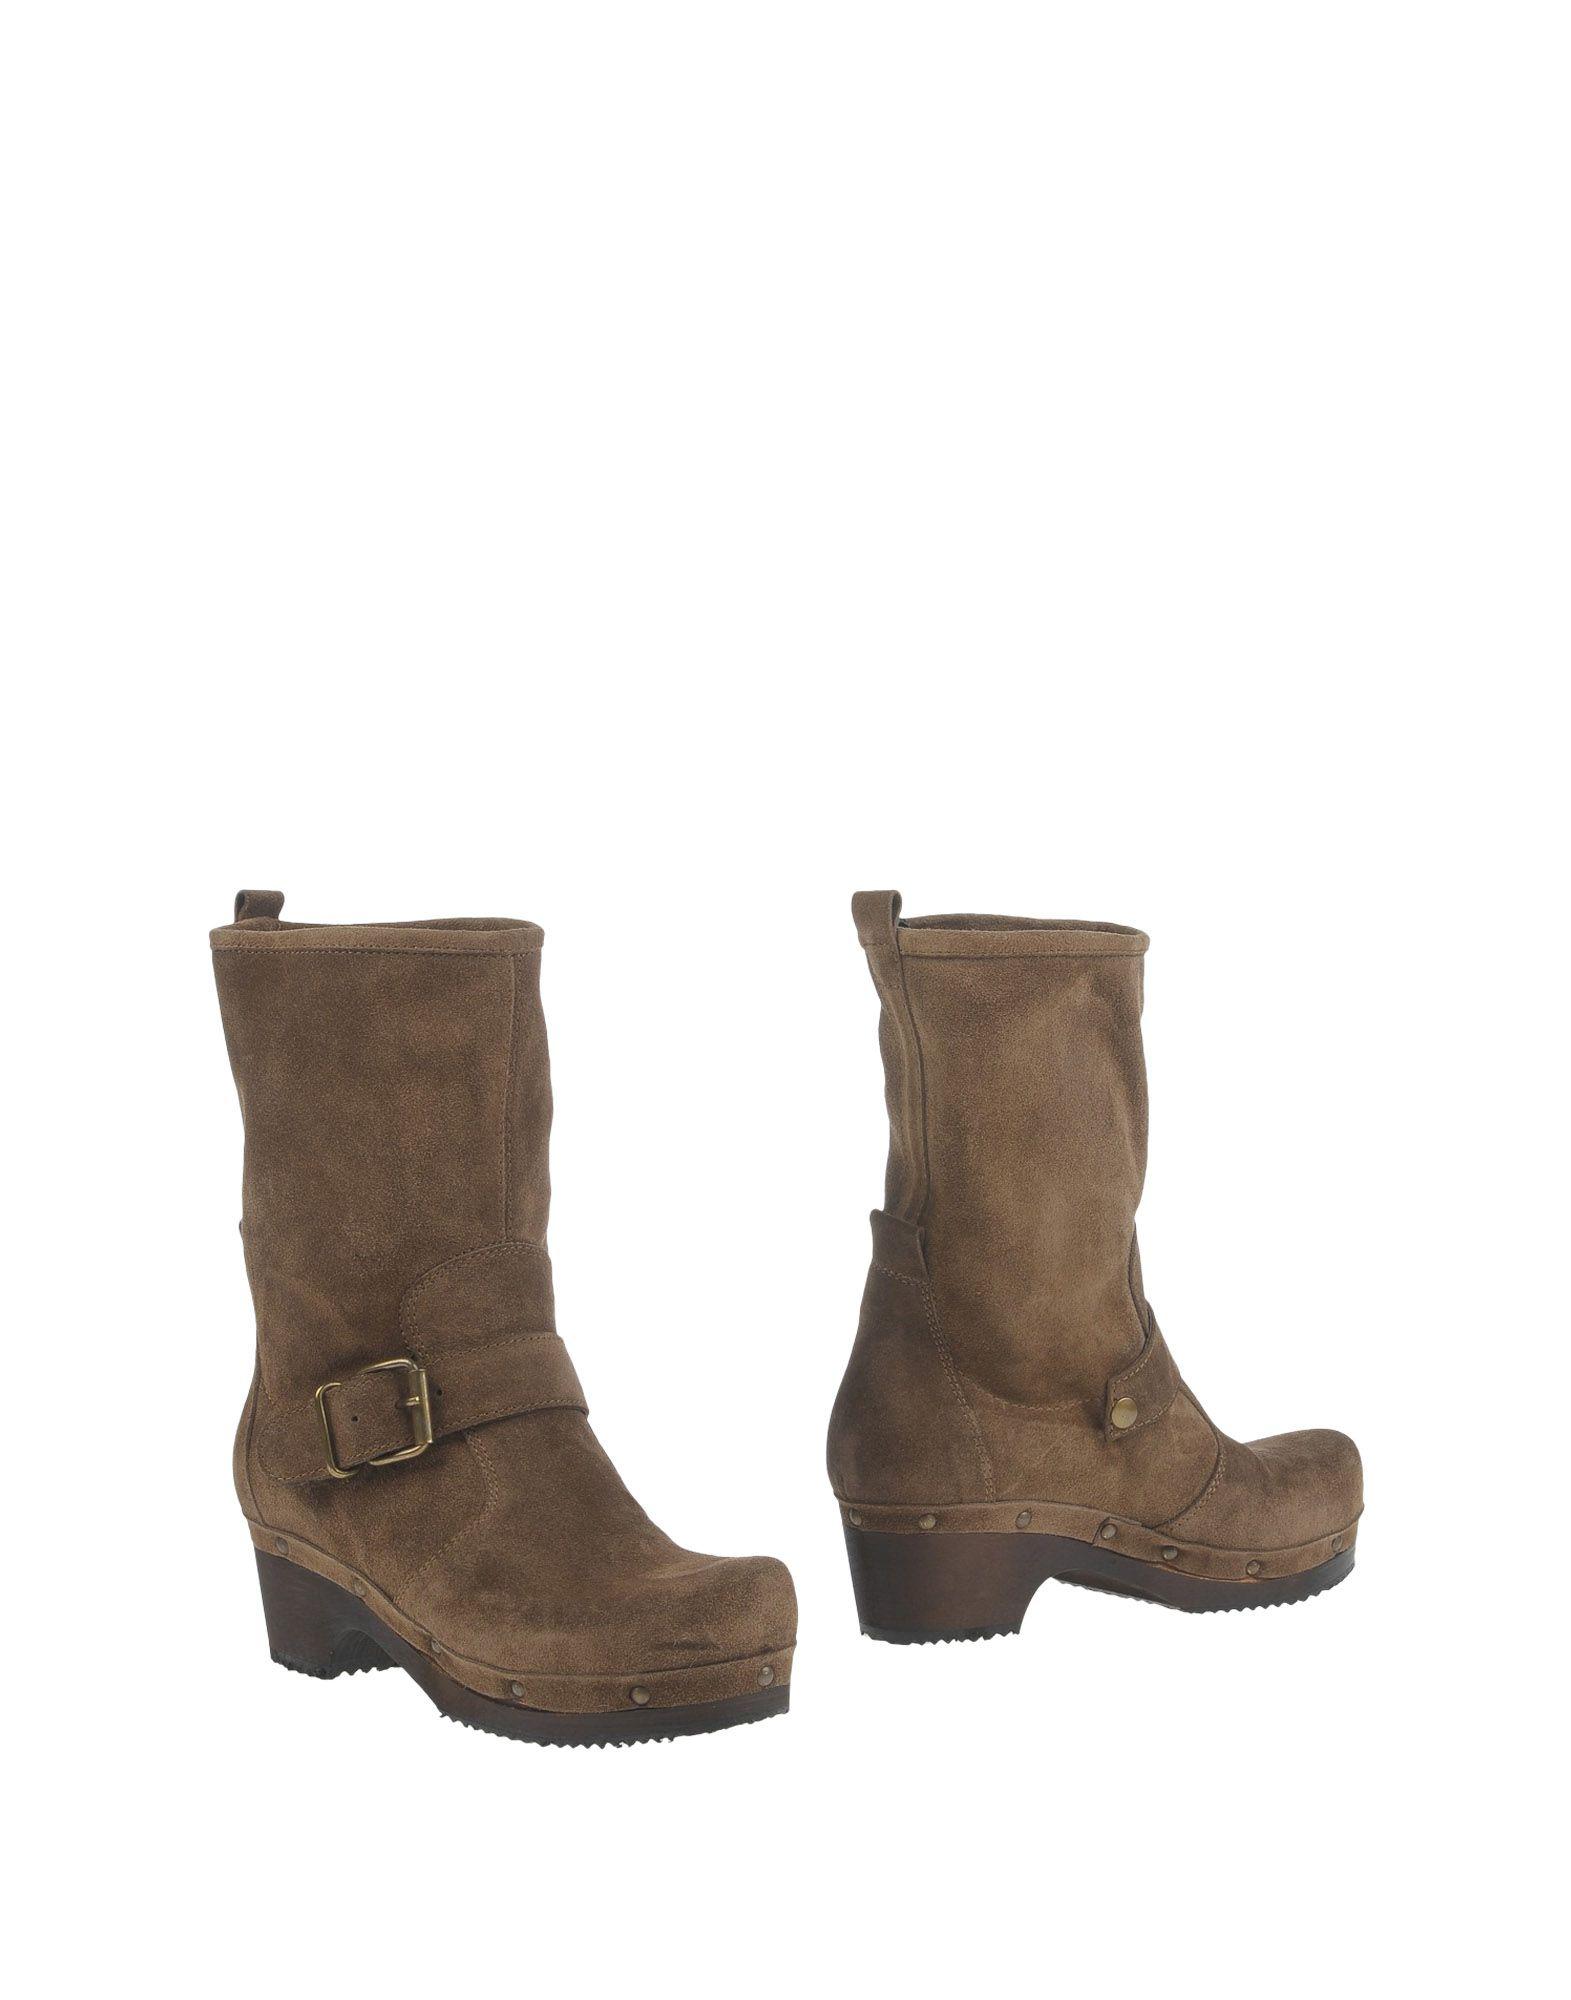 Islo Isabella Lorusso Islo Ankle Boot - Women Islo Lorusso Isabella Lorusso Ankle Boots online on  United Kingdom - 11302715KK af881e